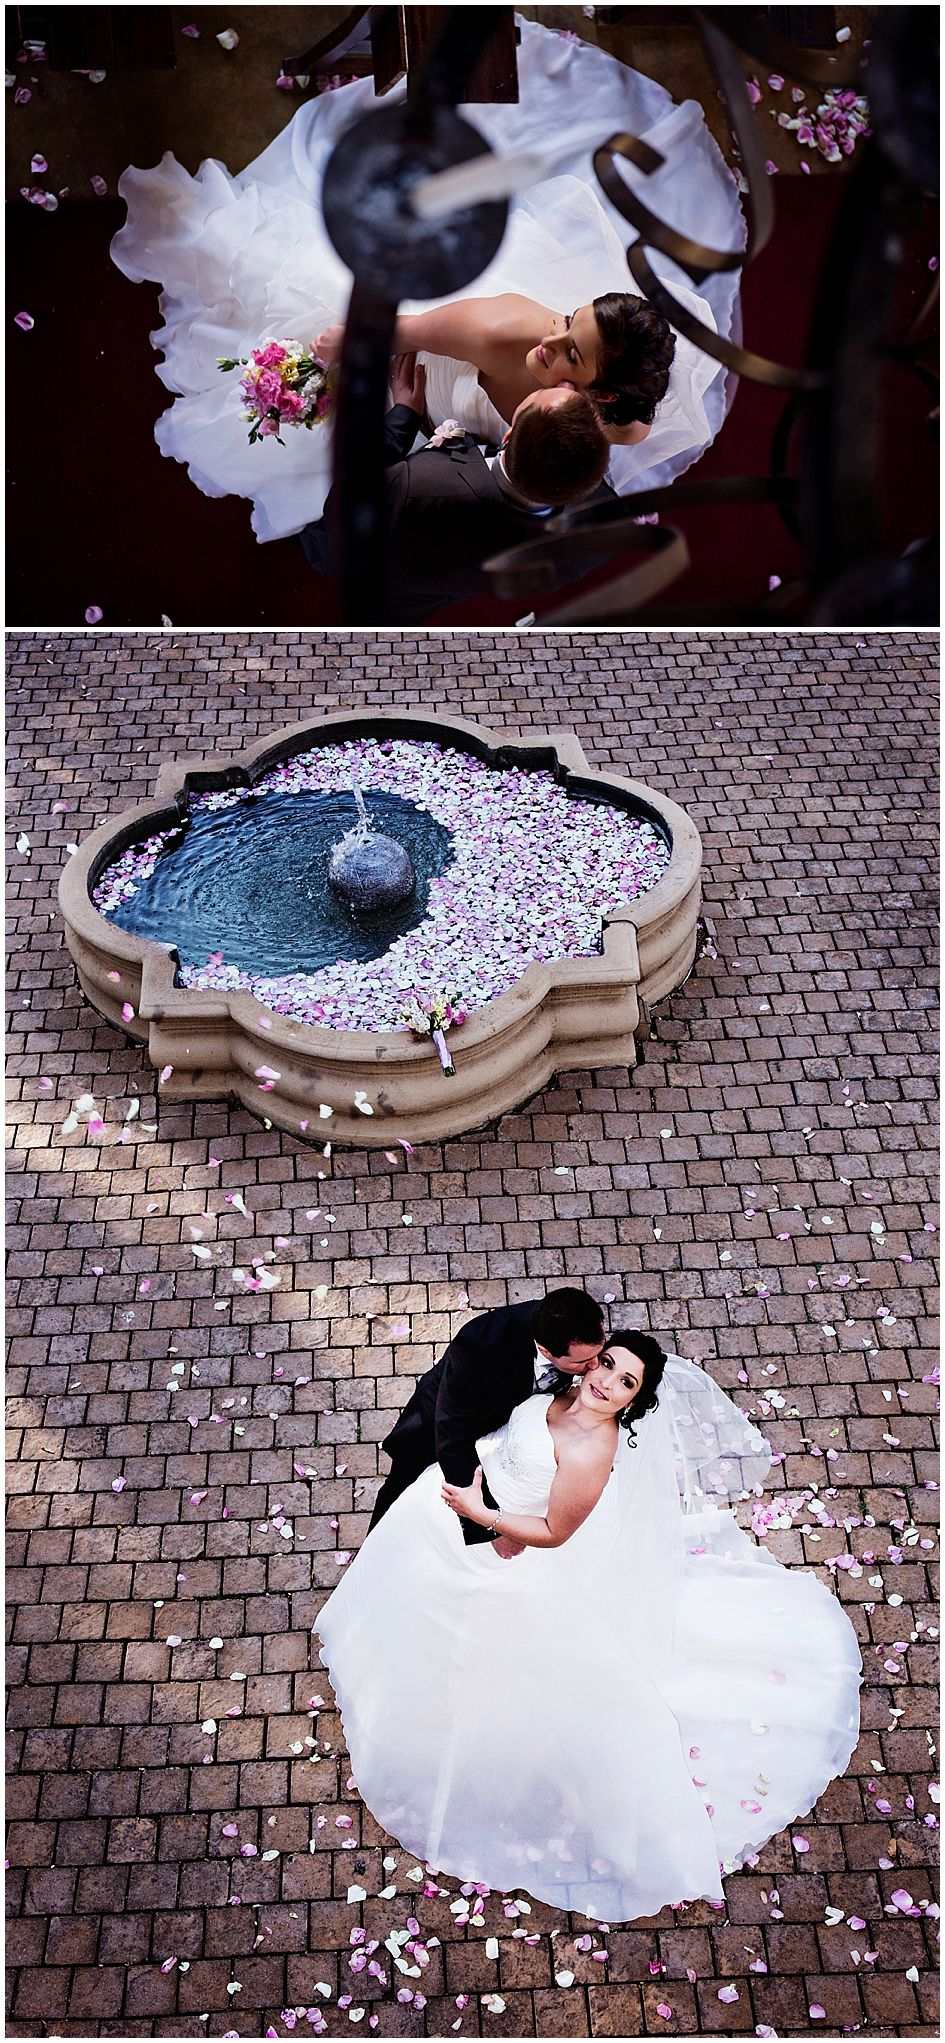 creative-aerial-wedding-photoshoot.jpg